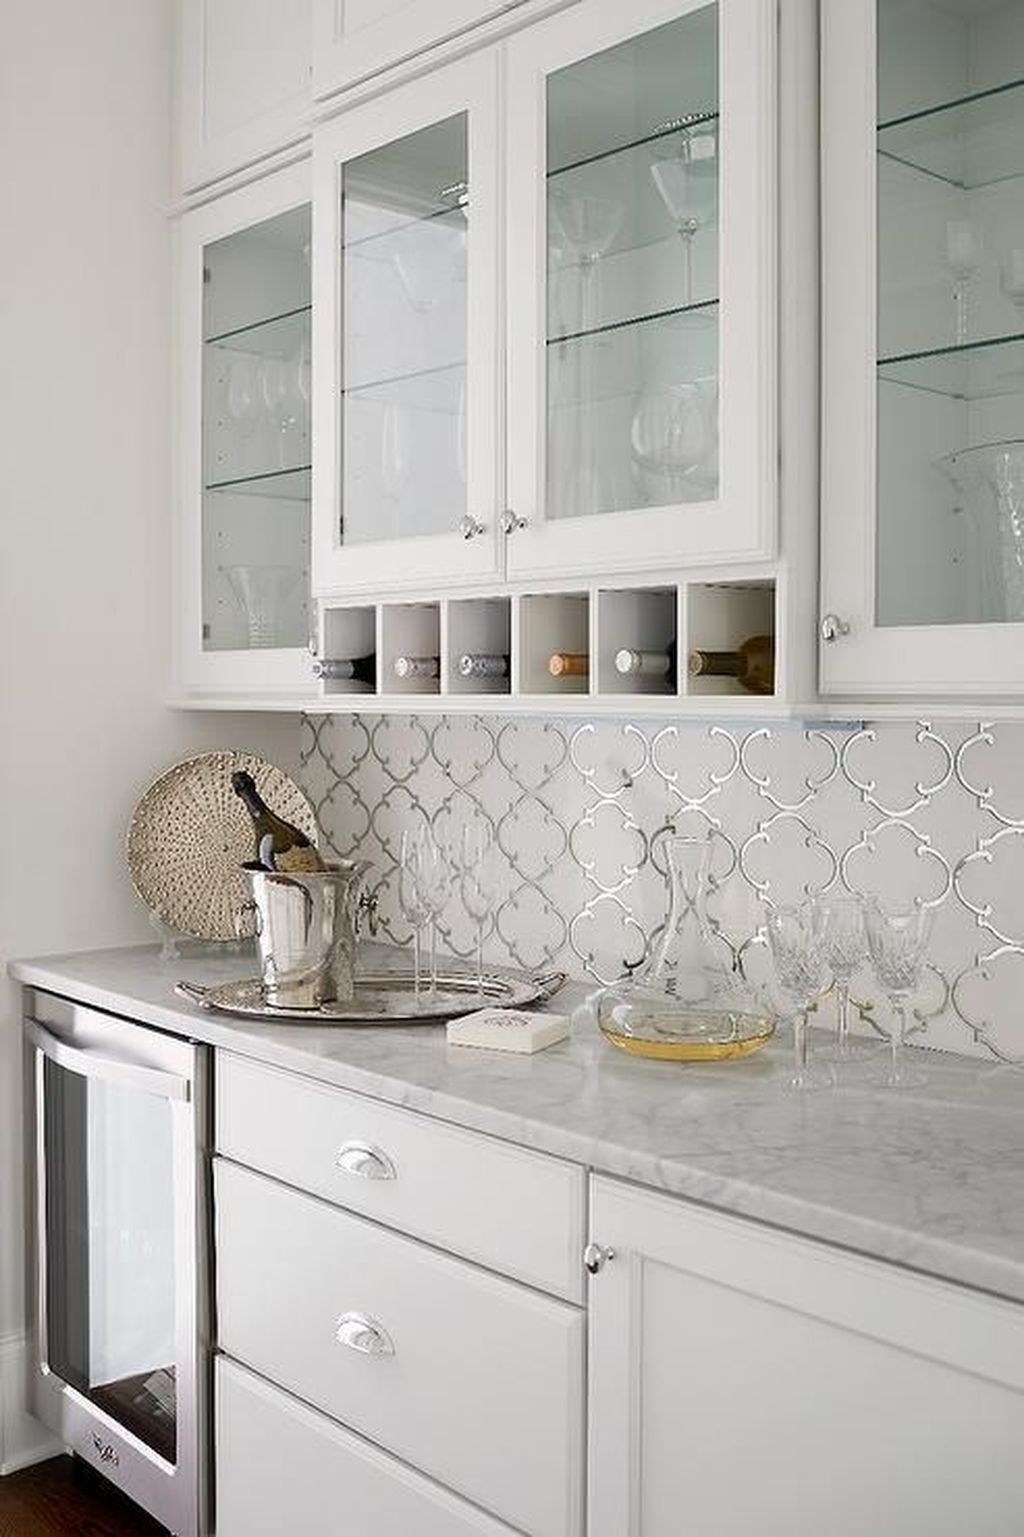 20+ Pretty White Kitchen Backsplash Ideas - TRENDECORS #kitchenbacksplash